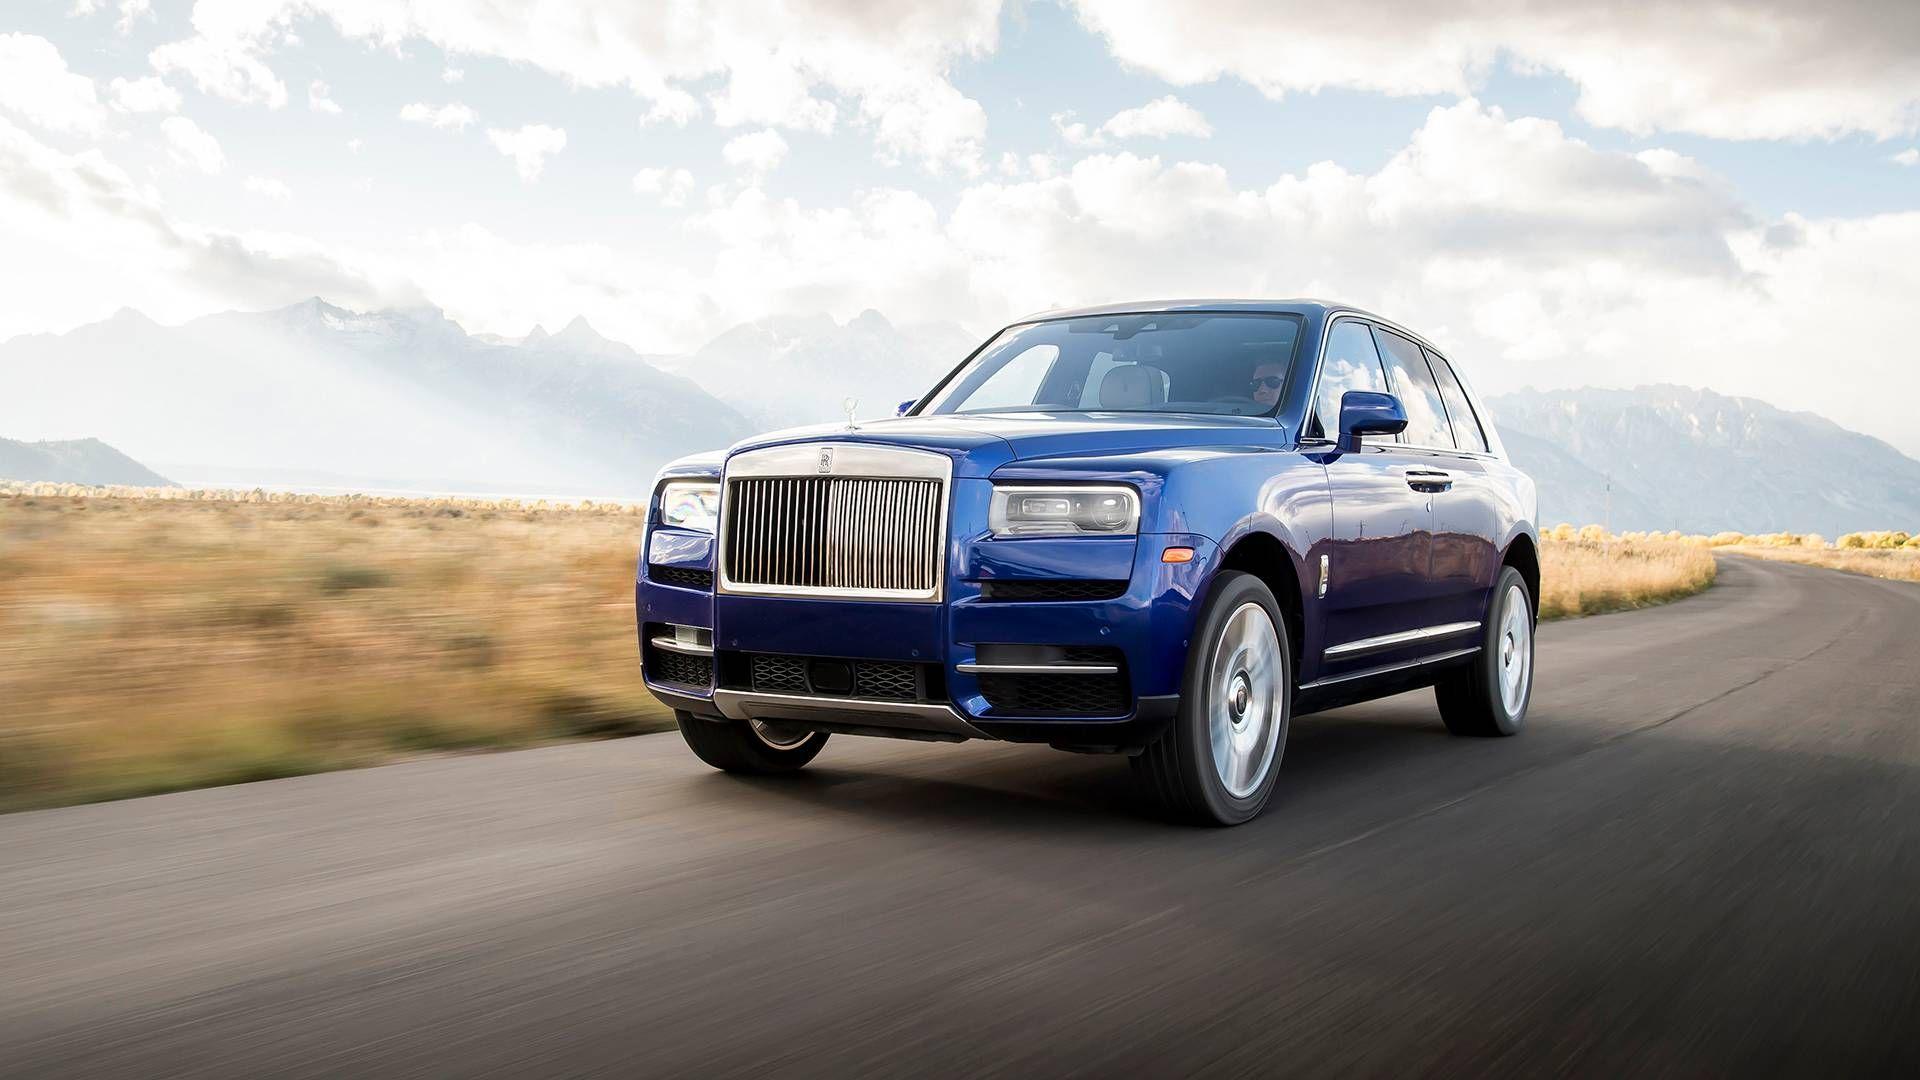 2019 Rolls Royce Cullinan First Drive Motor1 Com Photos Rolls Royce Rolls Royce Cullinan Luxury Cars Rolls Royce